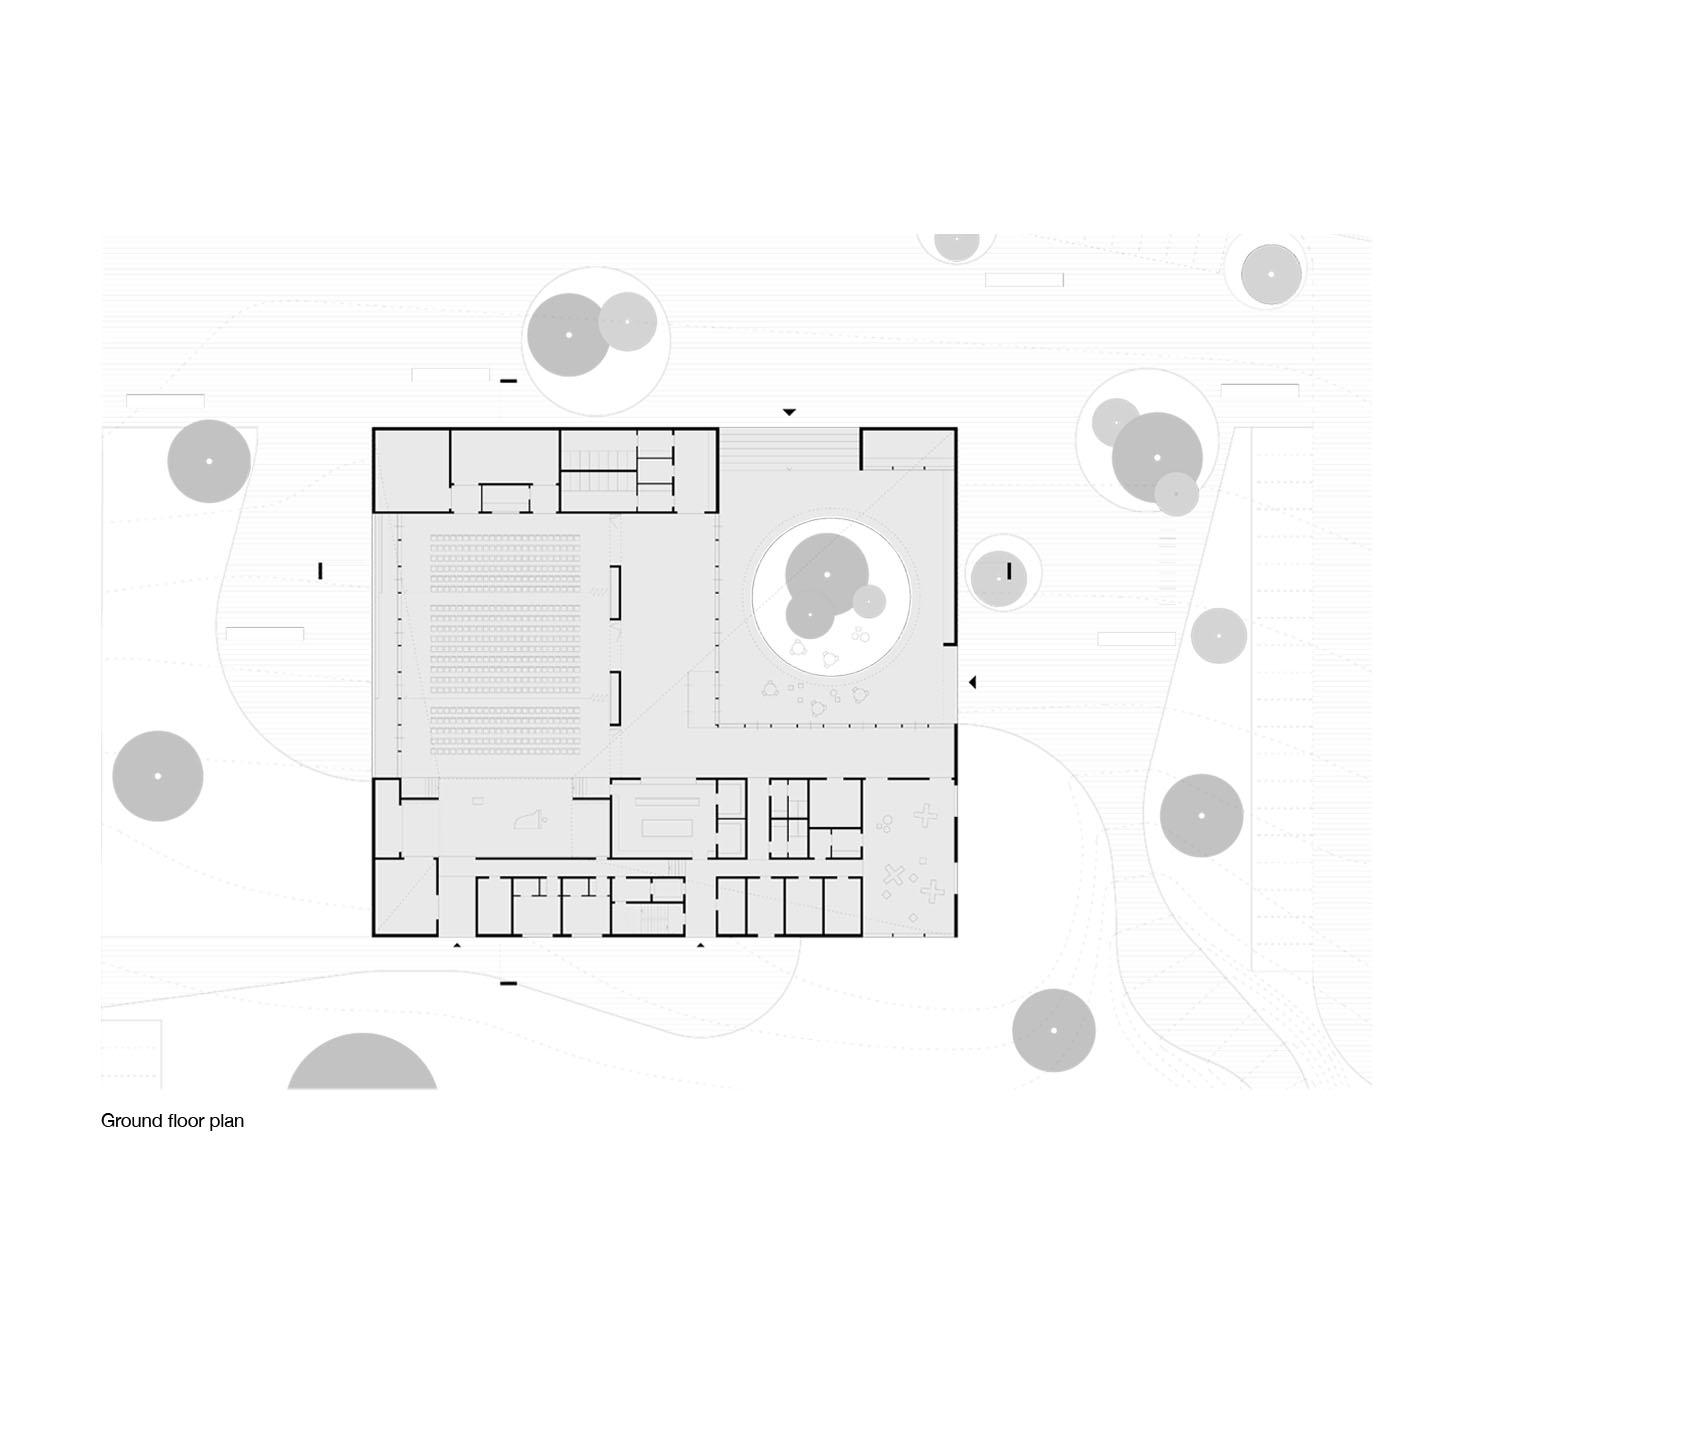 Auditorium-Grossbottwar-Image 05.jpg